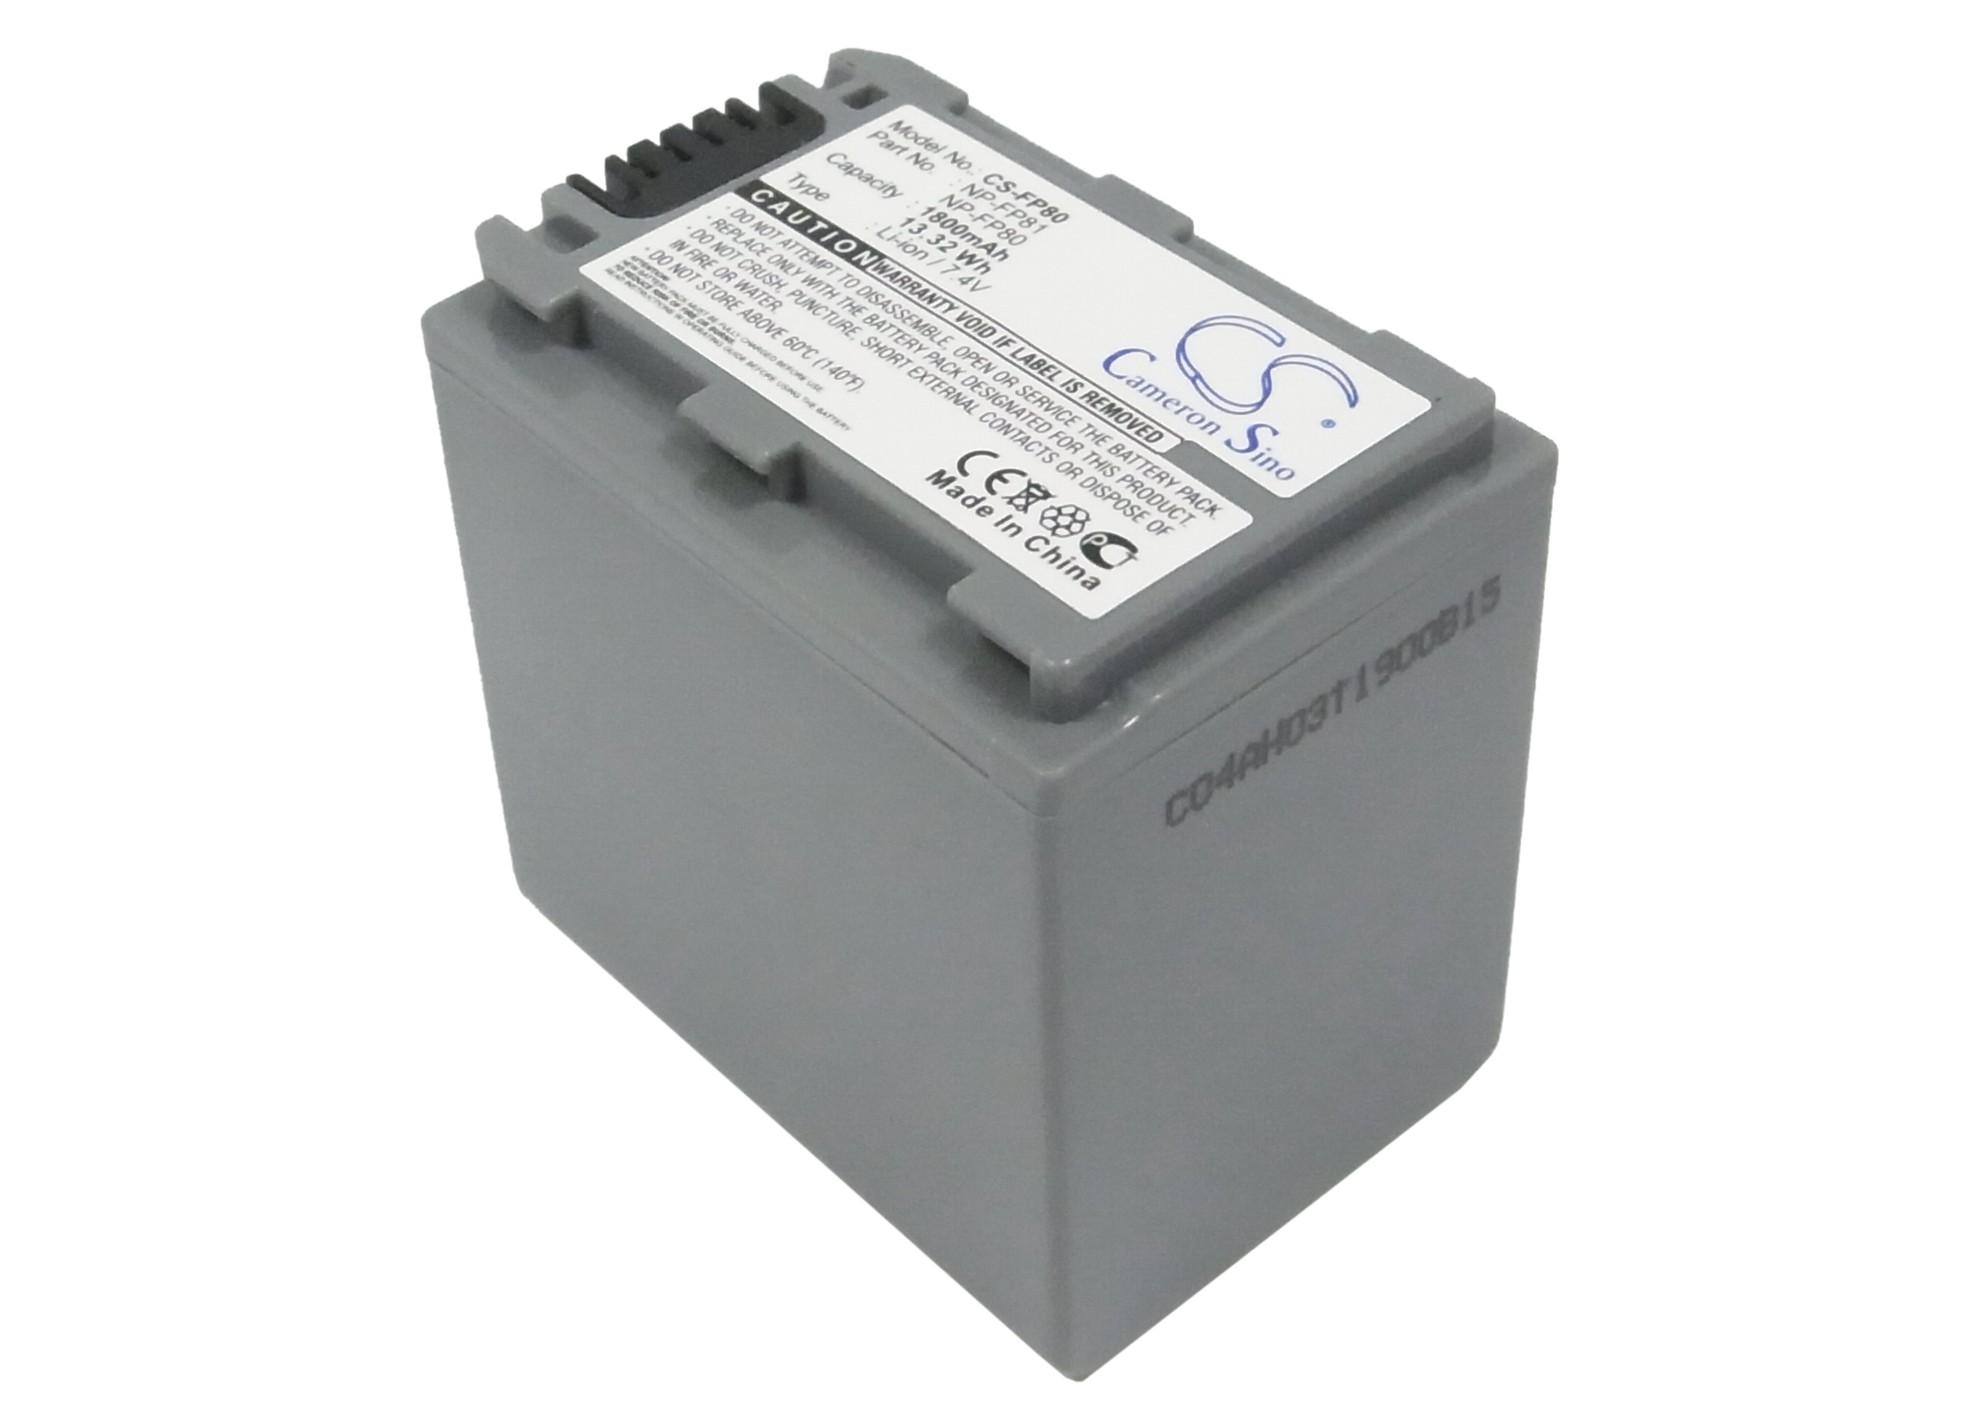 Cameron Sino baterie do kamer a fotoaparátů pro SONY DCR-DVD203E 7.4V Li-ion 1800mAh tmavě šedá - neoriginální